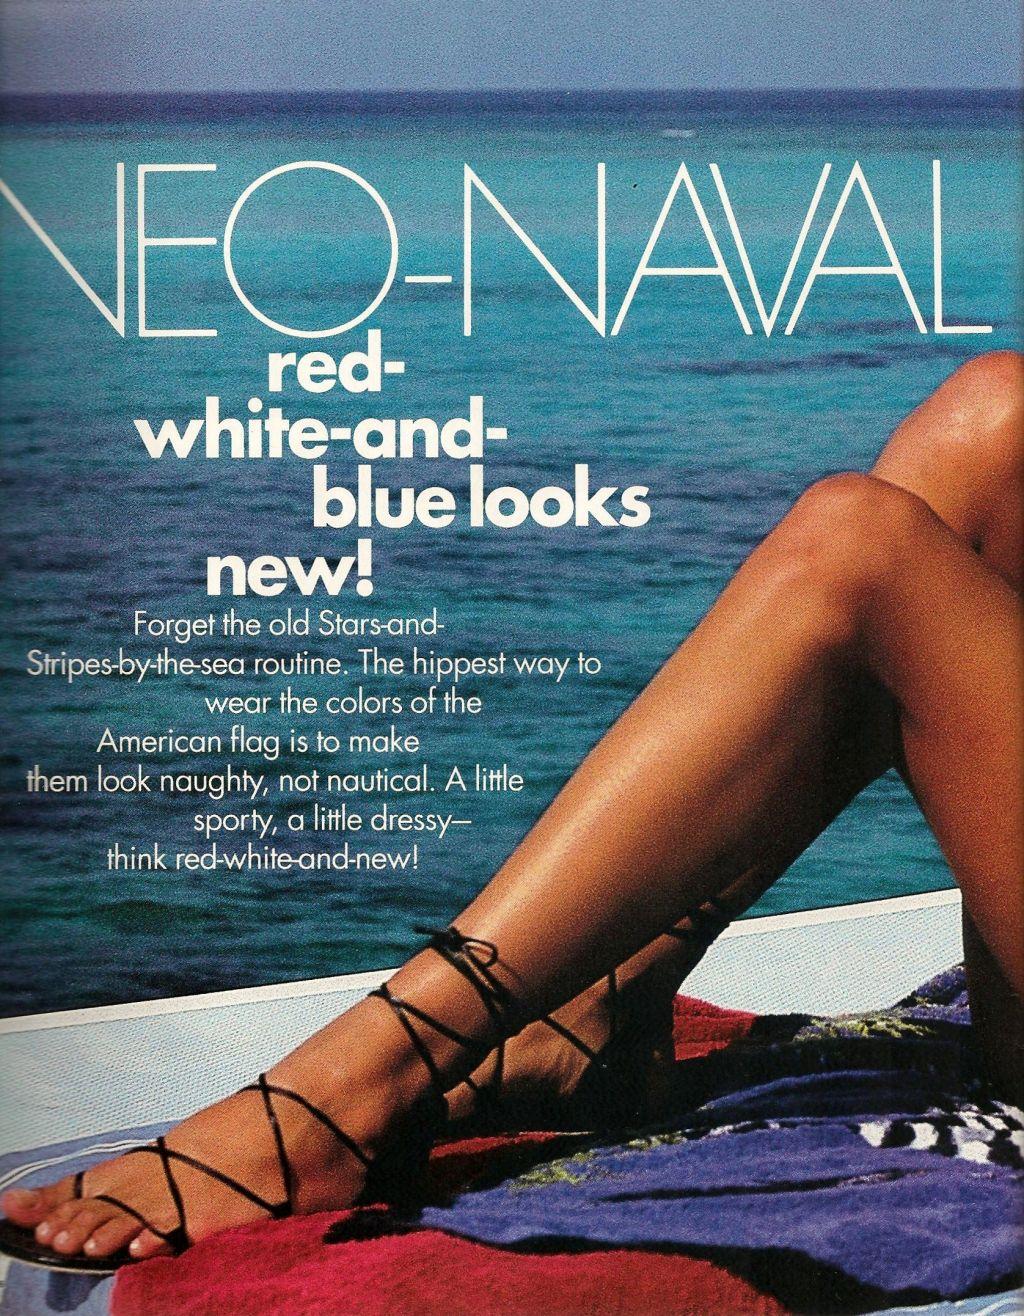 Elle (US) January 1991 | Neo-Naval 01.jpg